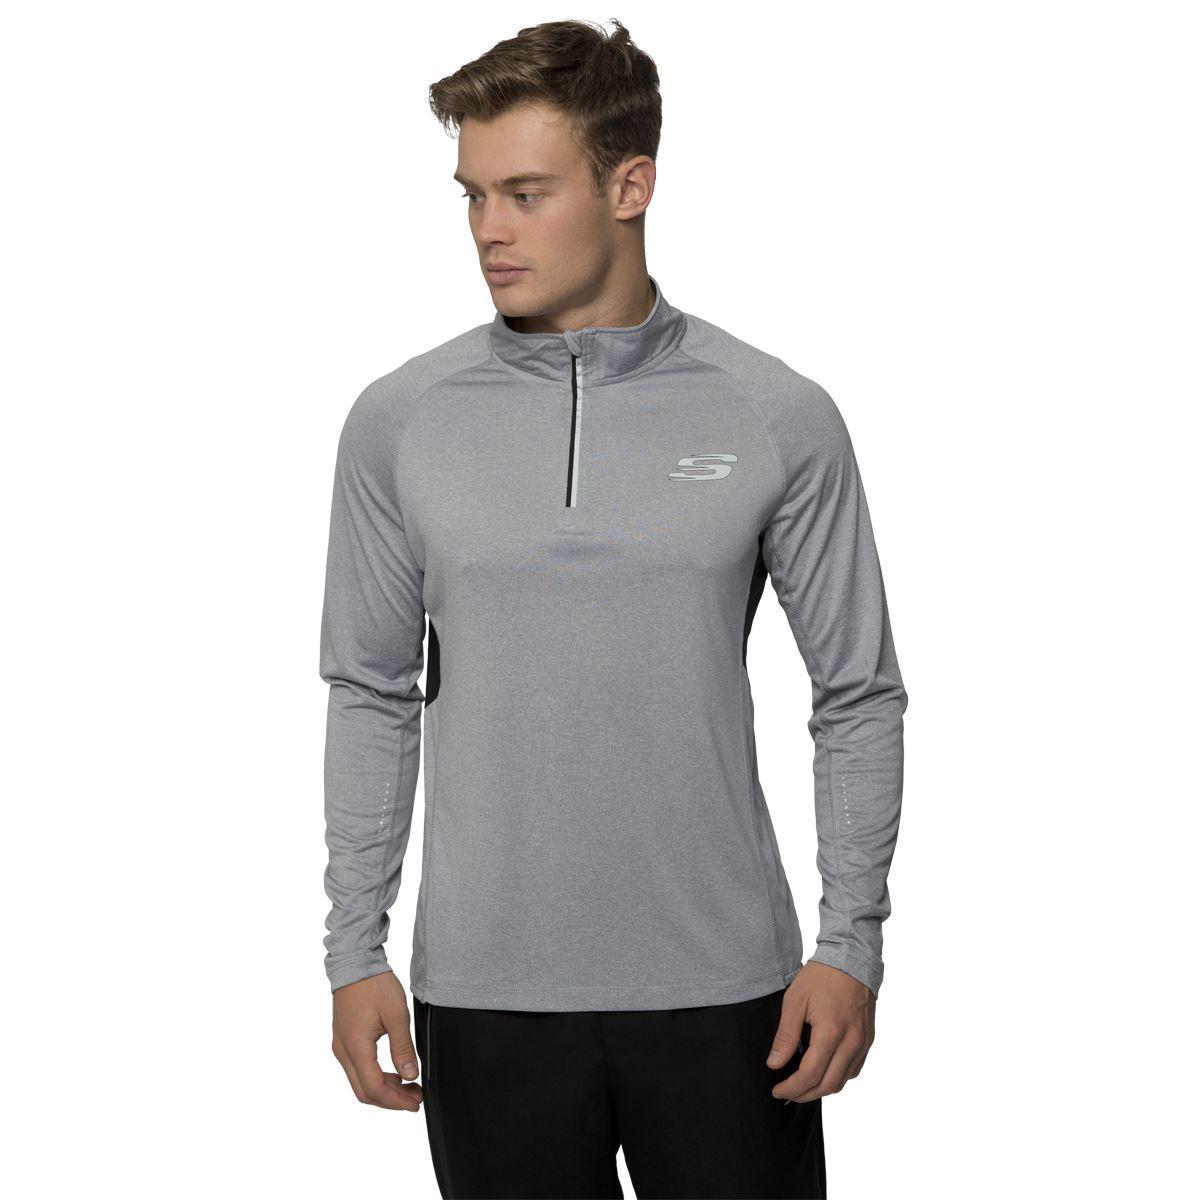 Skechers mens sports long sleeve t shirt half zip up for Best full sleeve t shirts